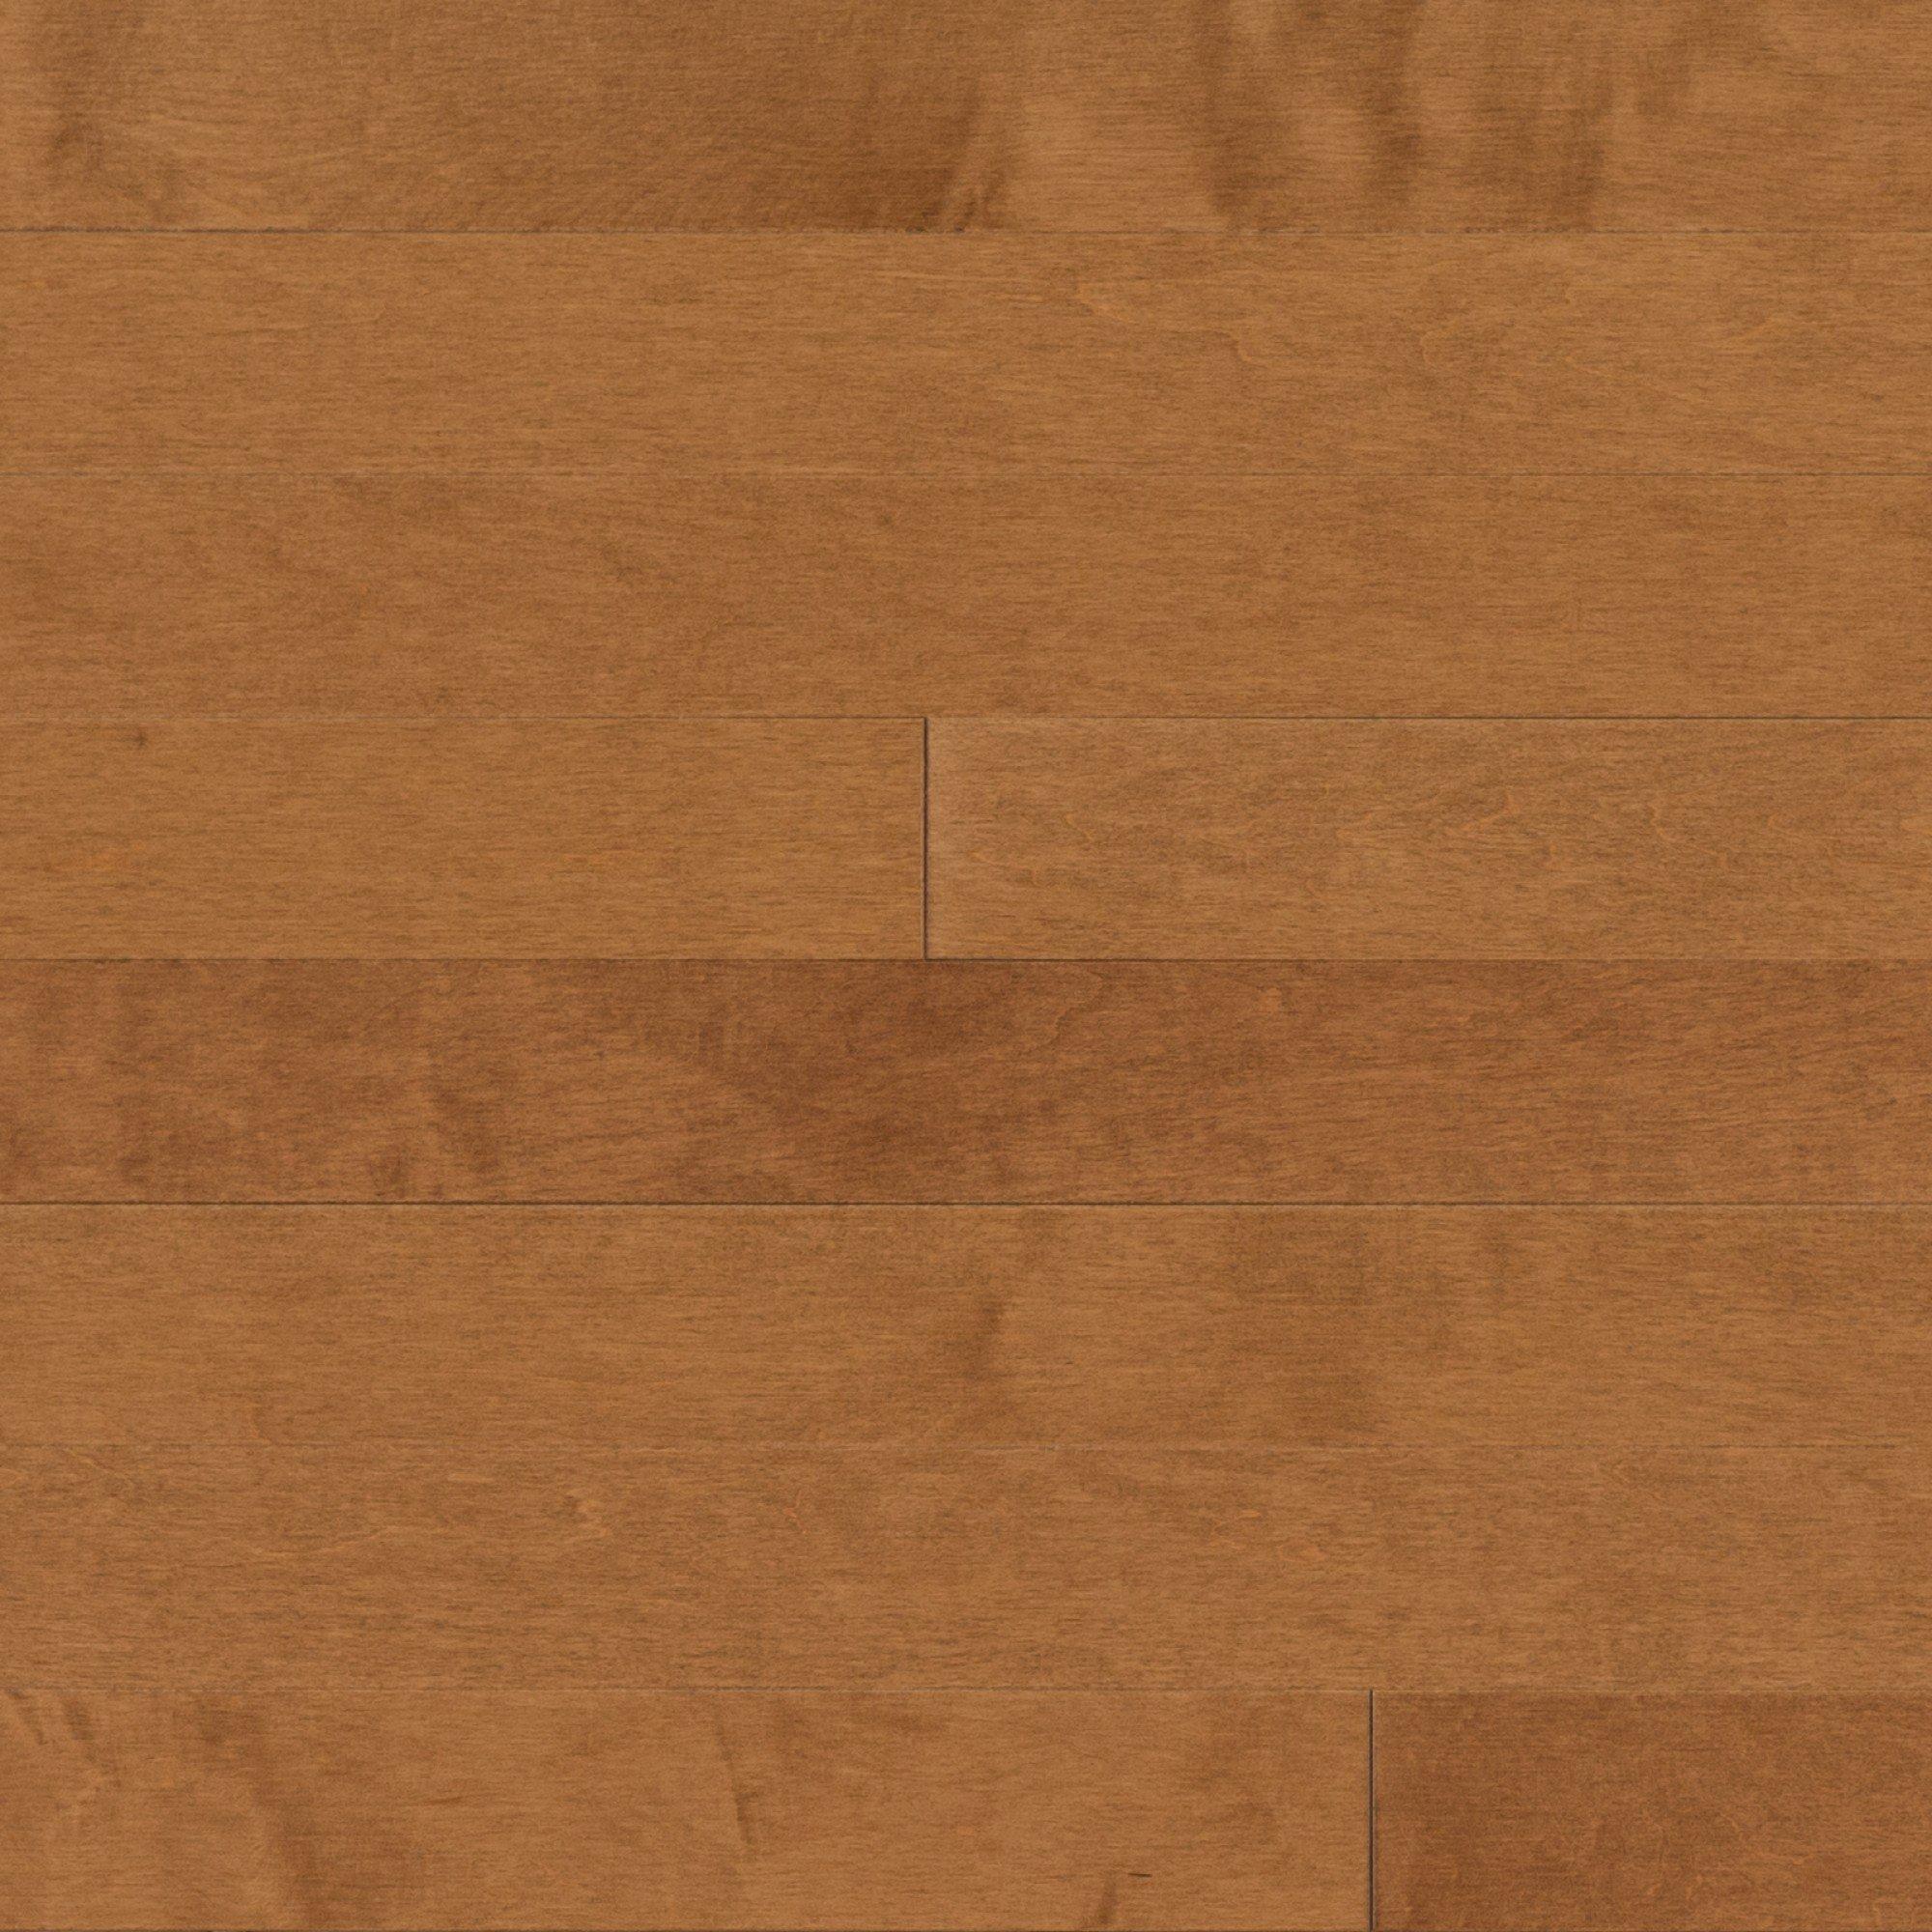 Admiration Maple Windsor Mirage Hardwood Floors